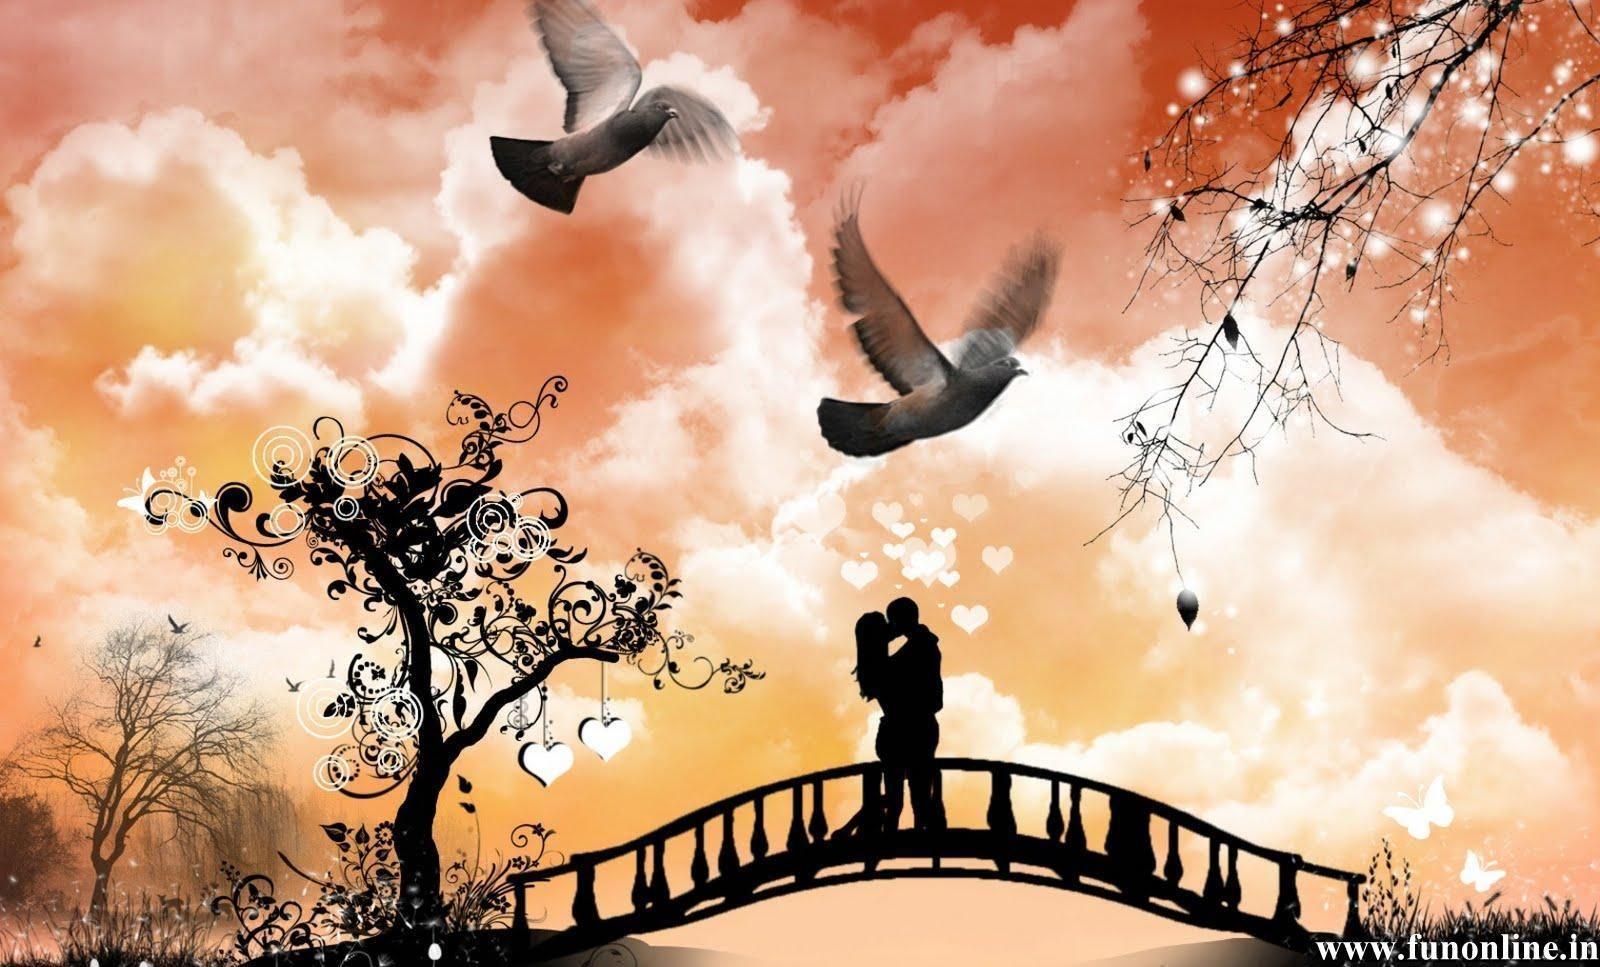 Desktop Wallpapers Romantic Love Wallpaper Cave